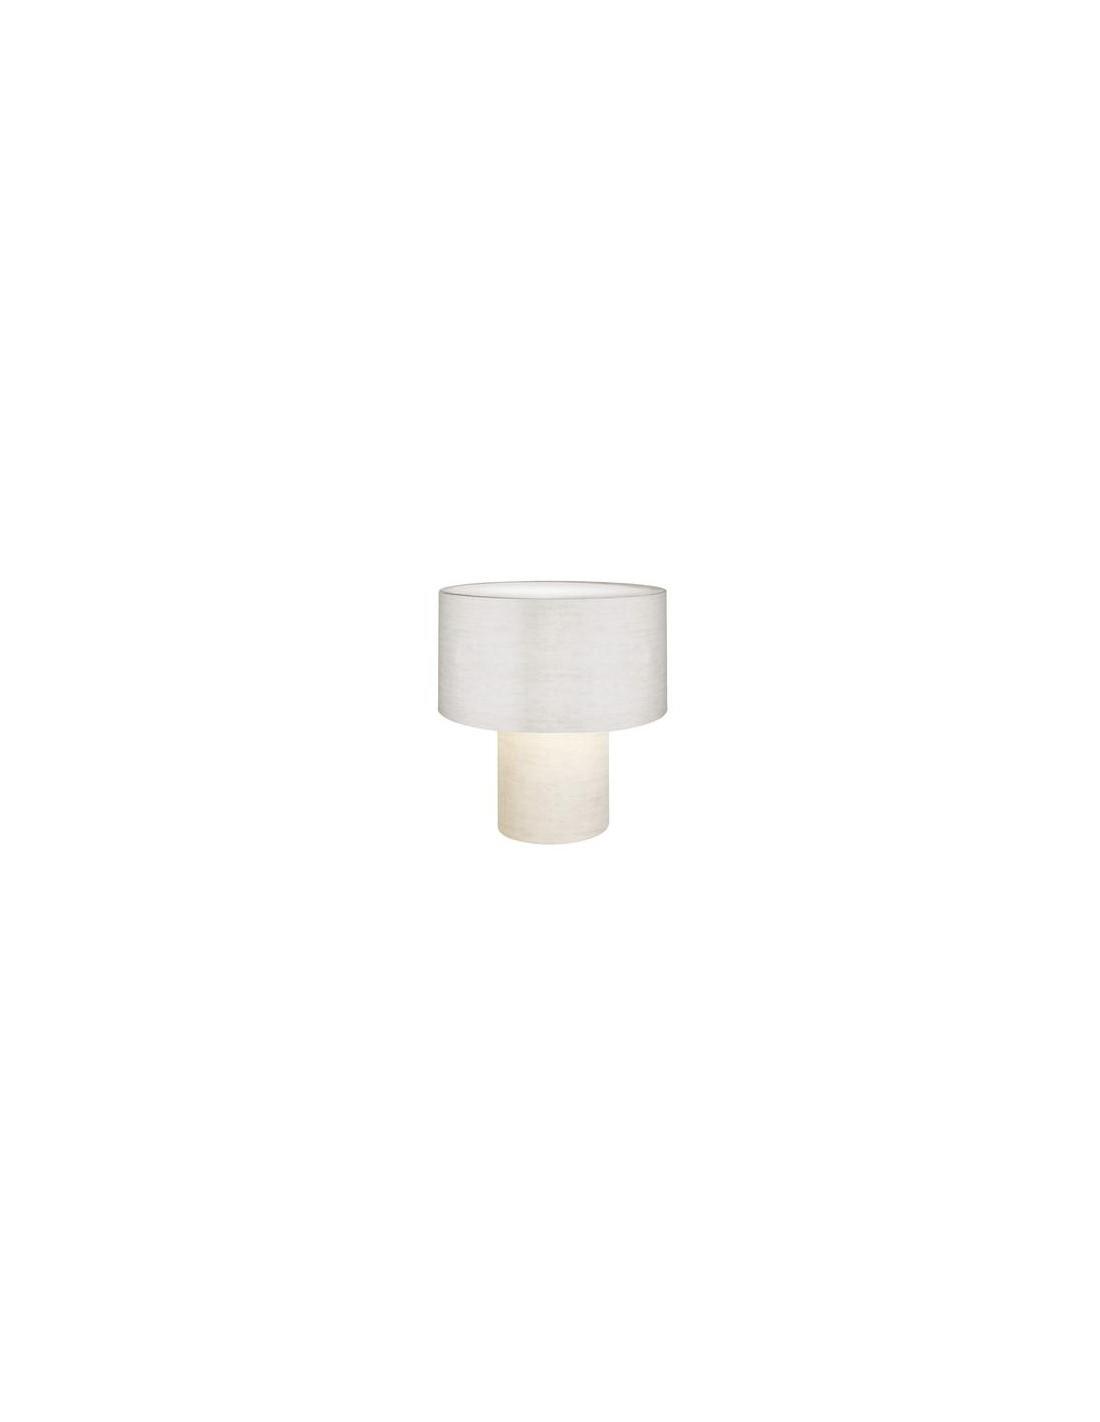 Lampe de table Pipe blanche Foscarini Diesel